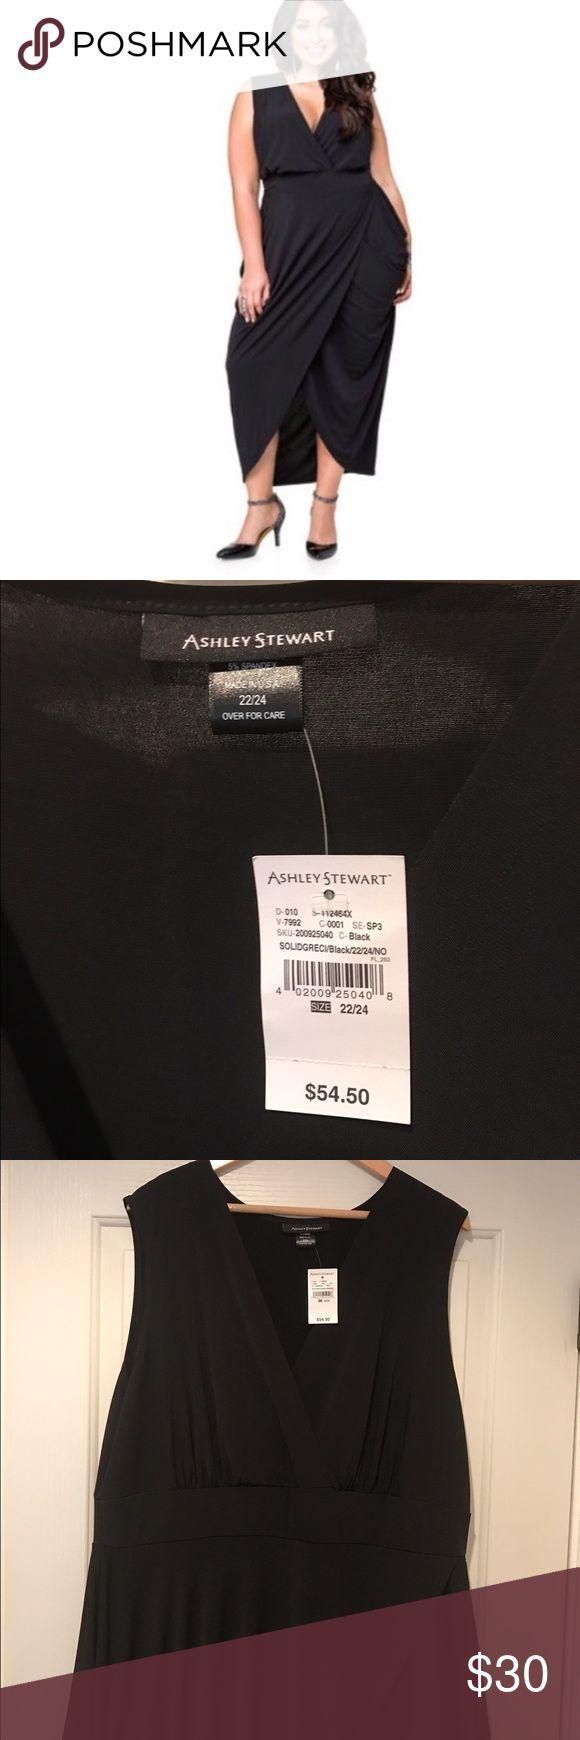 Black Grecian Surplice Dress Black tulip bottom dress. Never worn. Tags intact. Ashley Stewart Dresses